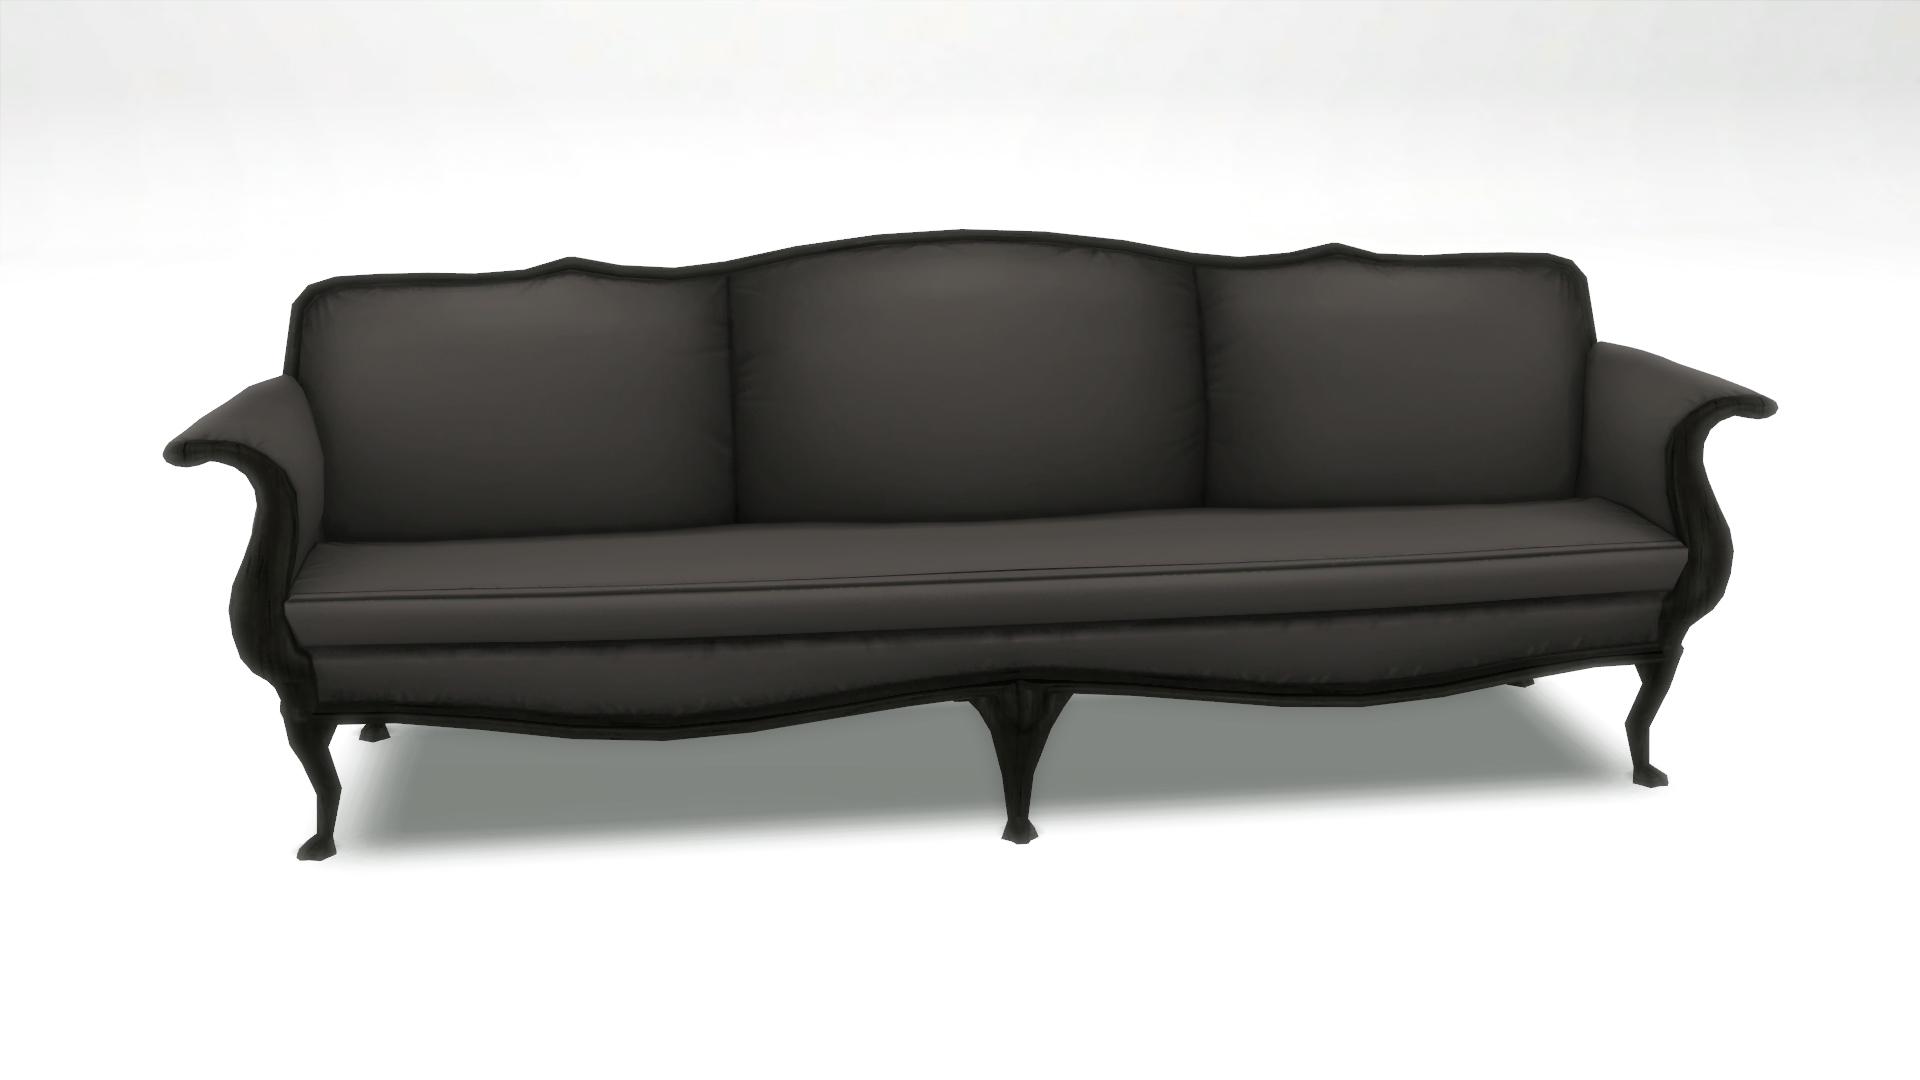 sofa frame making resource wegner sofaer priser mod the sims sonata 3 conversion